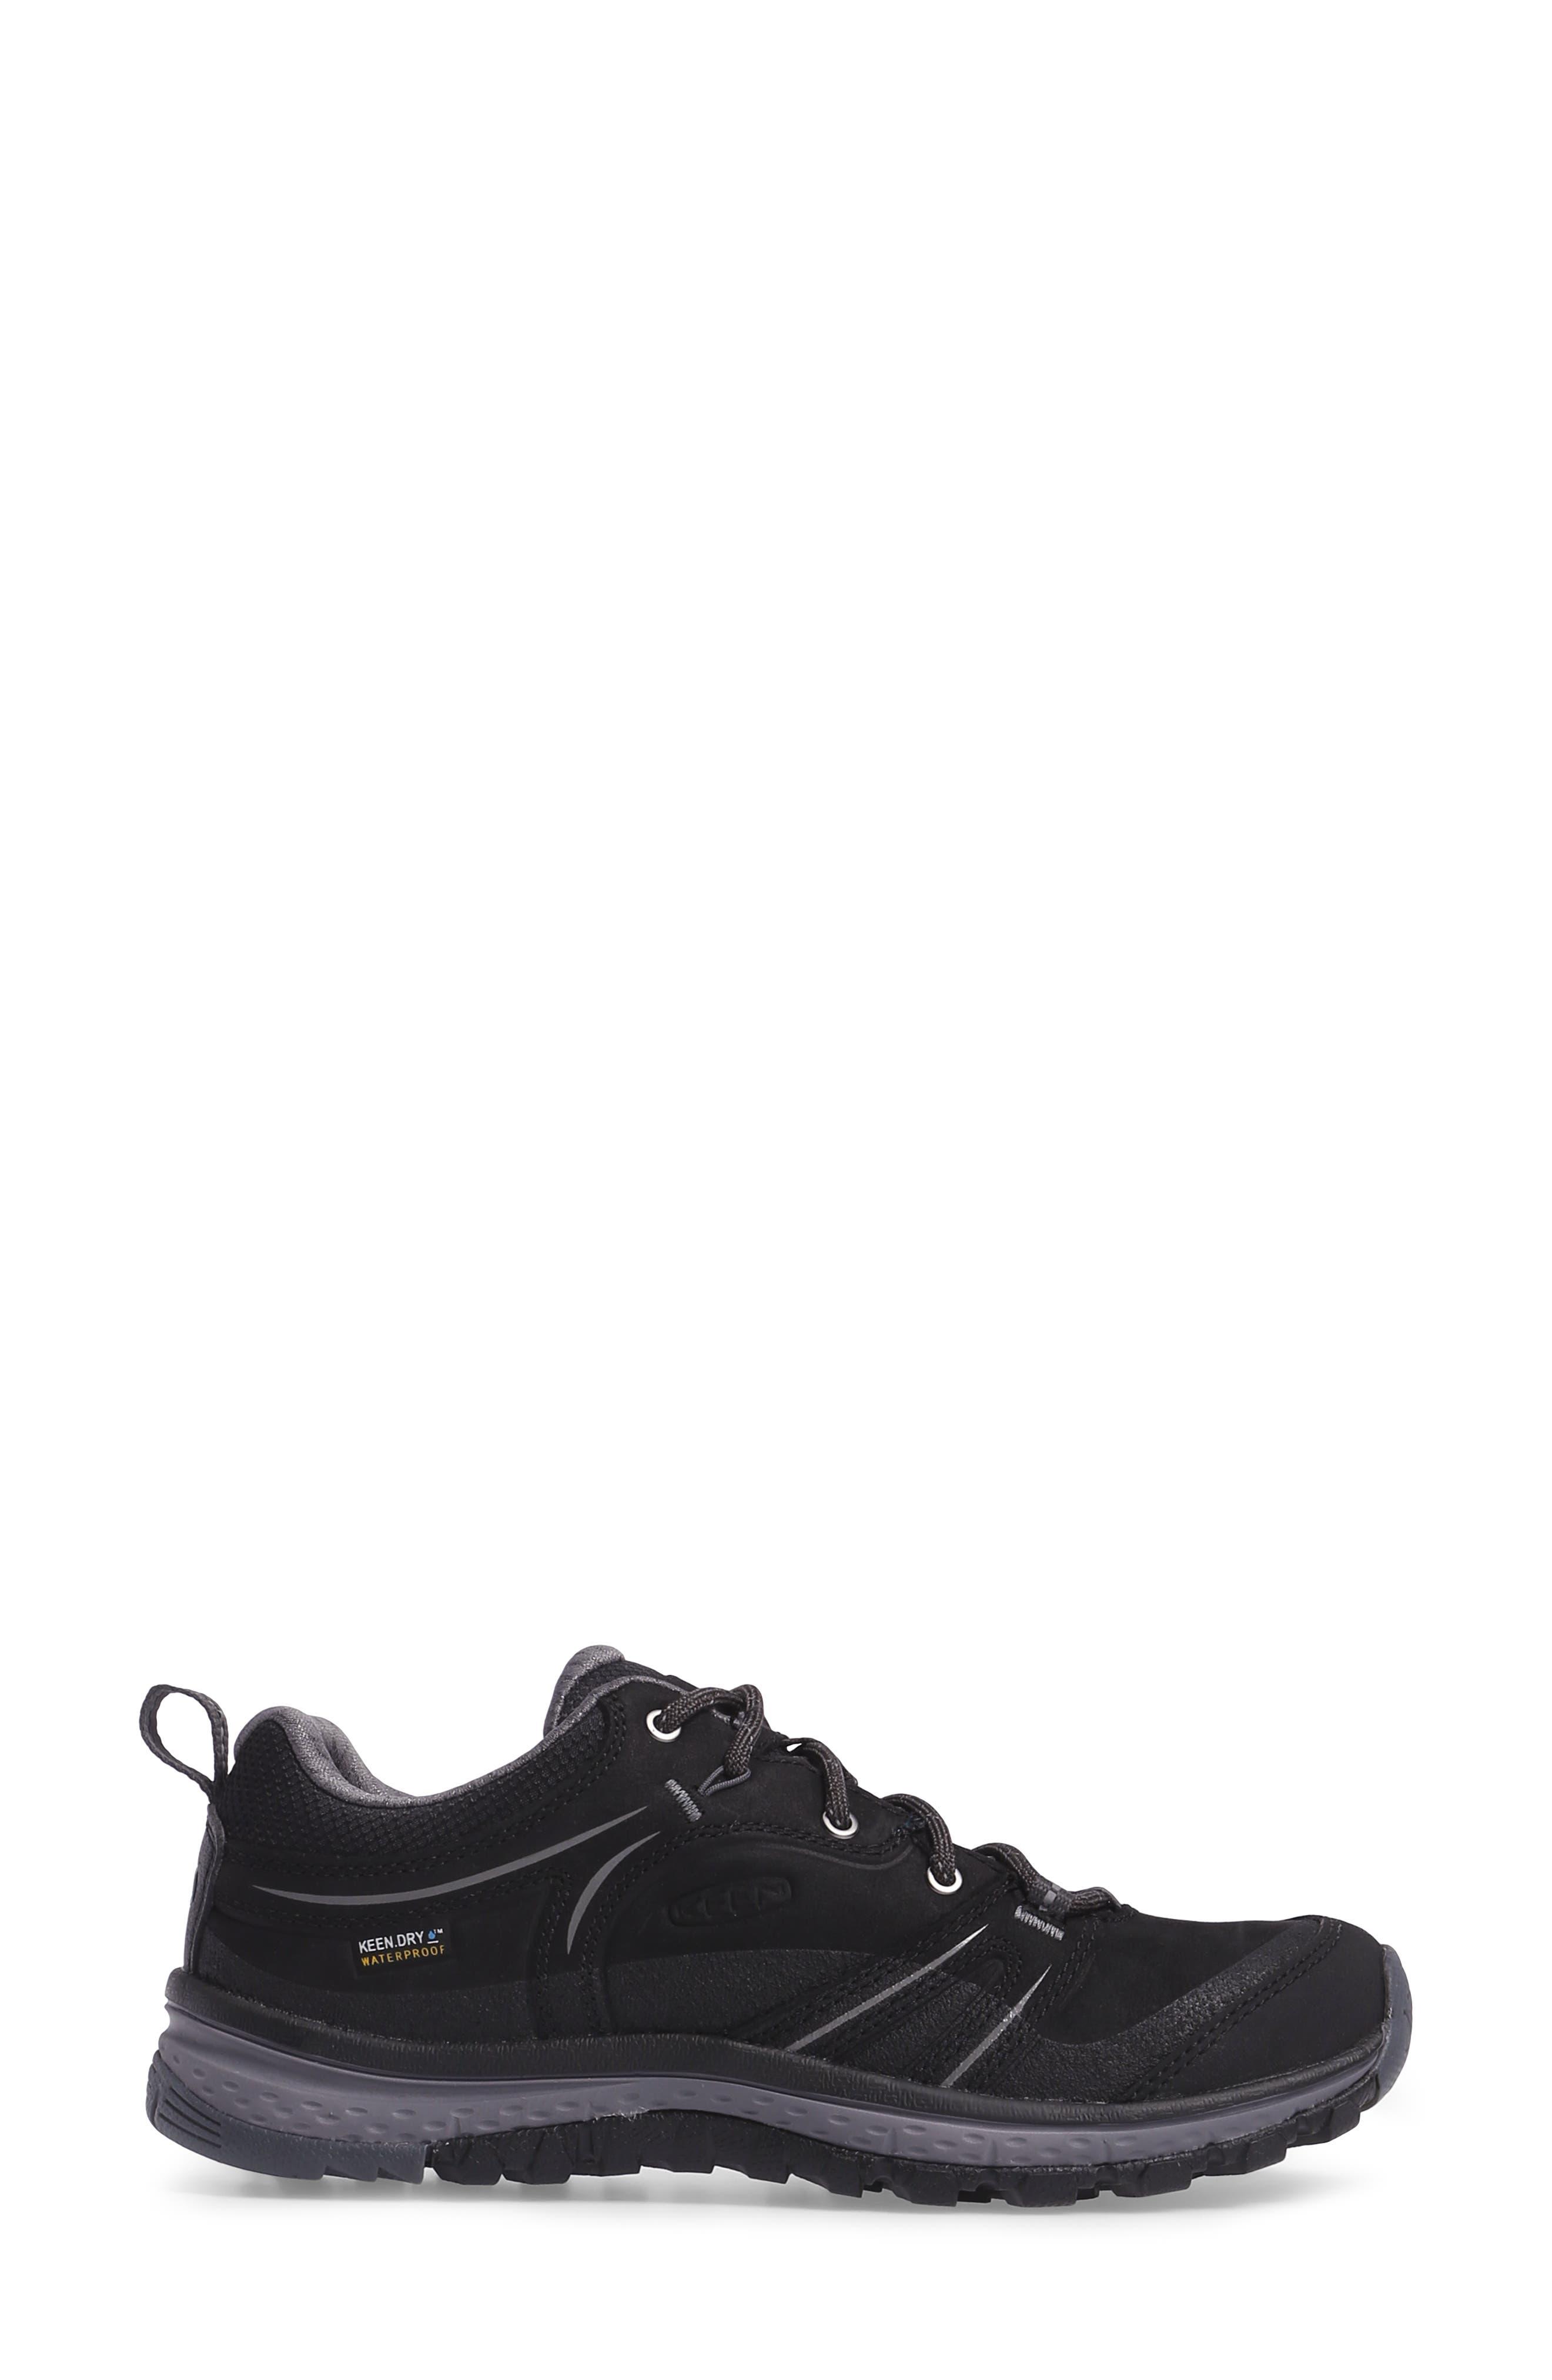 Terradora Waterproof Hiking Shoe,                             Alternate thumbnail 3, color,                             Black/ Steel Grey Nubuck